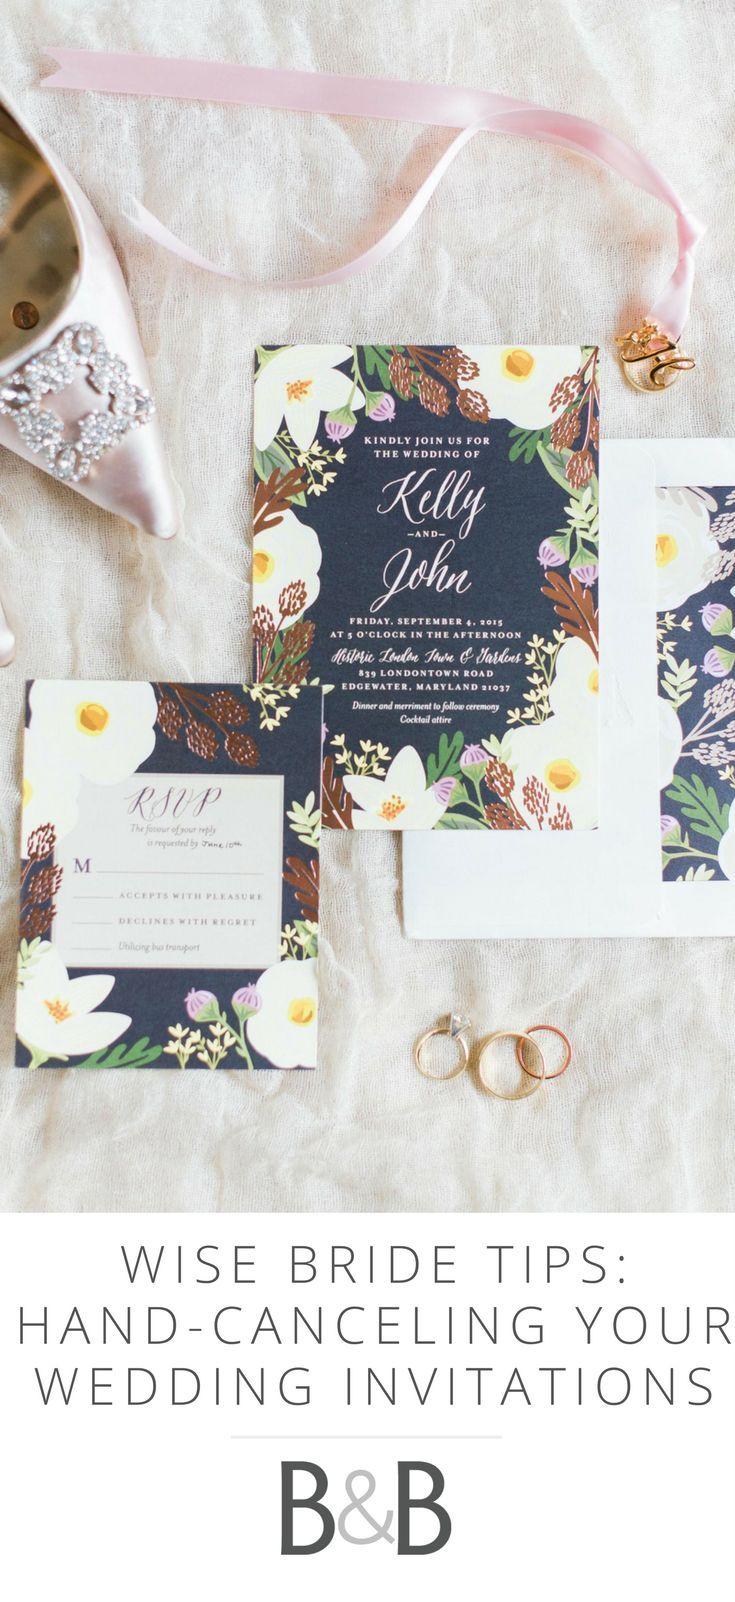 wise bride tips hand canceling wedding invitations - Hand Cancelling Wedding Invitations